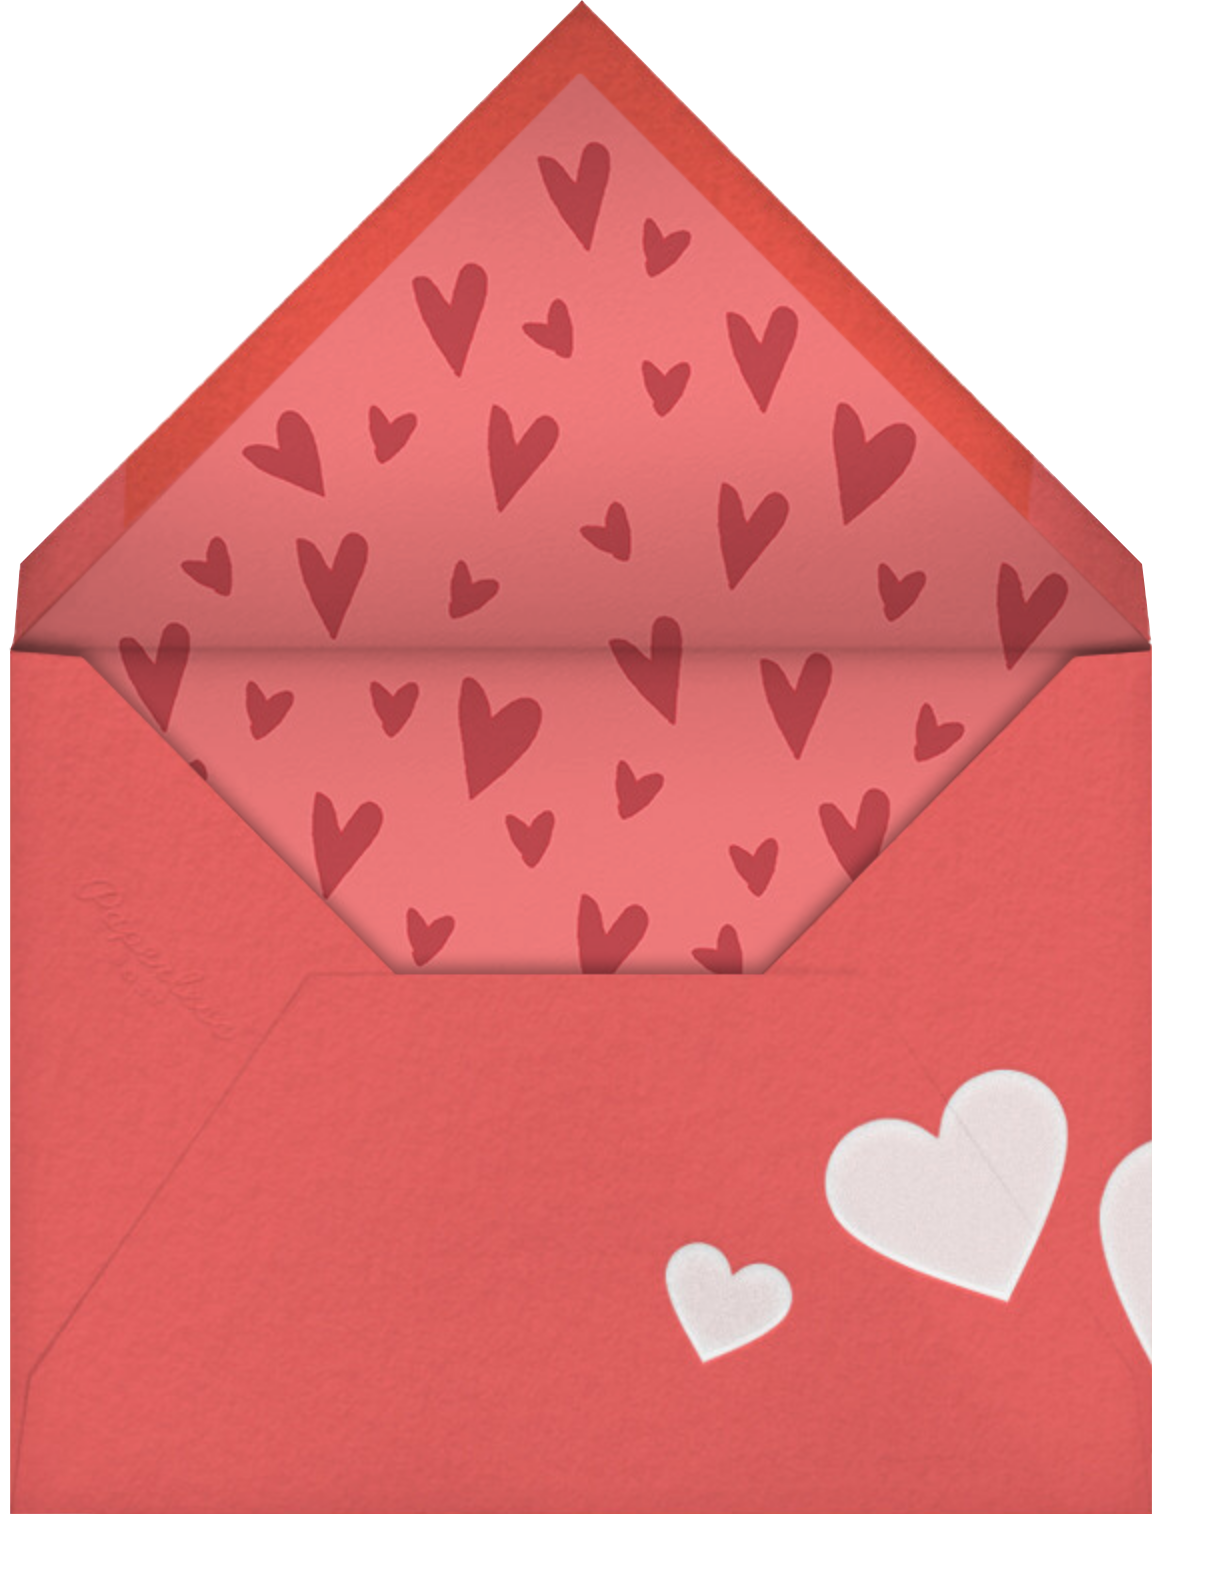 70s Love - Paperless Post - Valentine's Day - envelope back